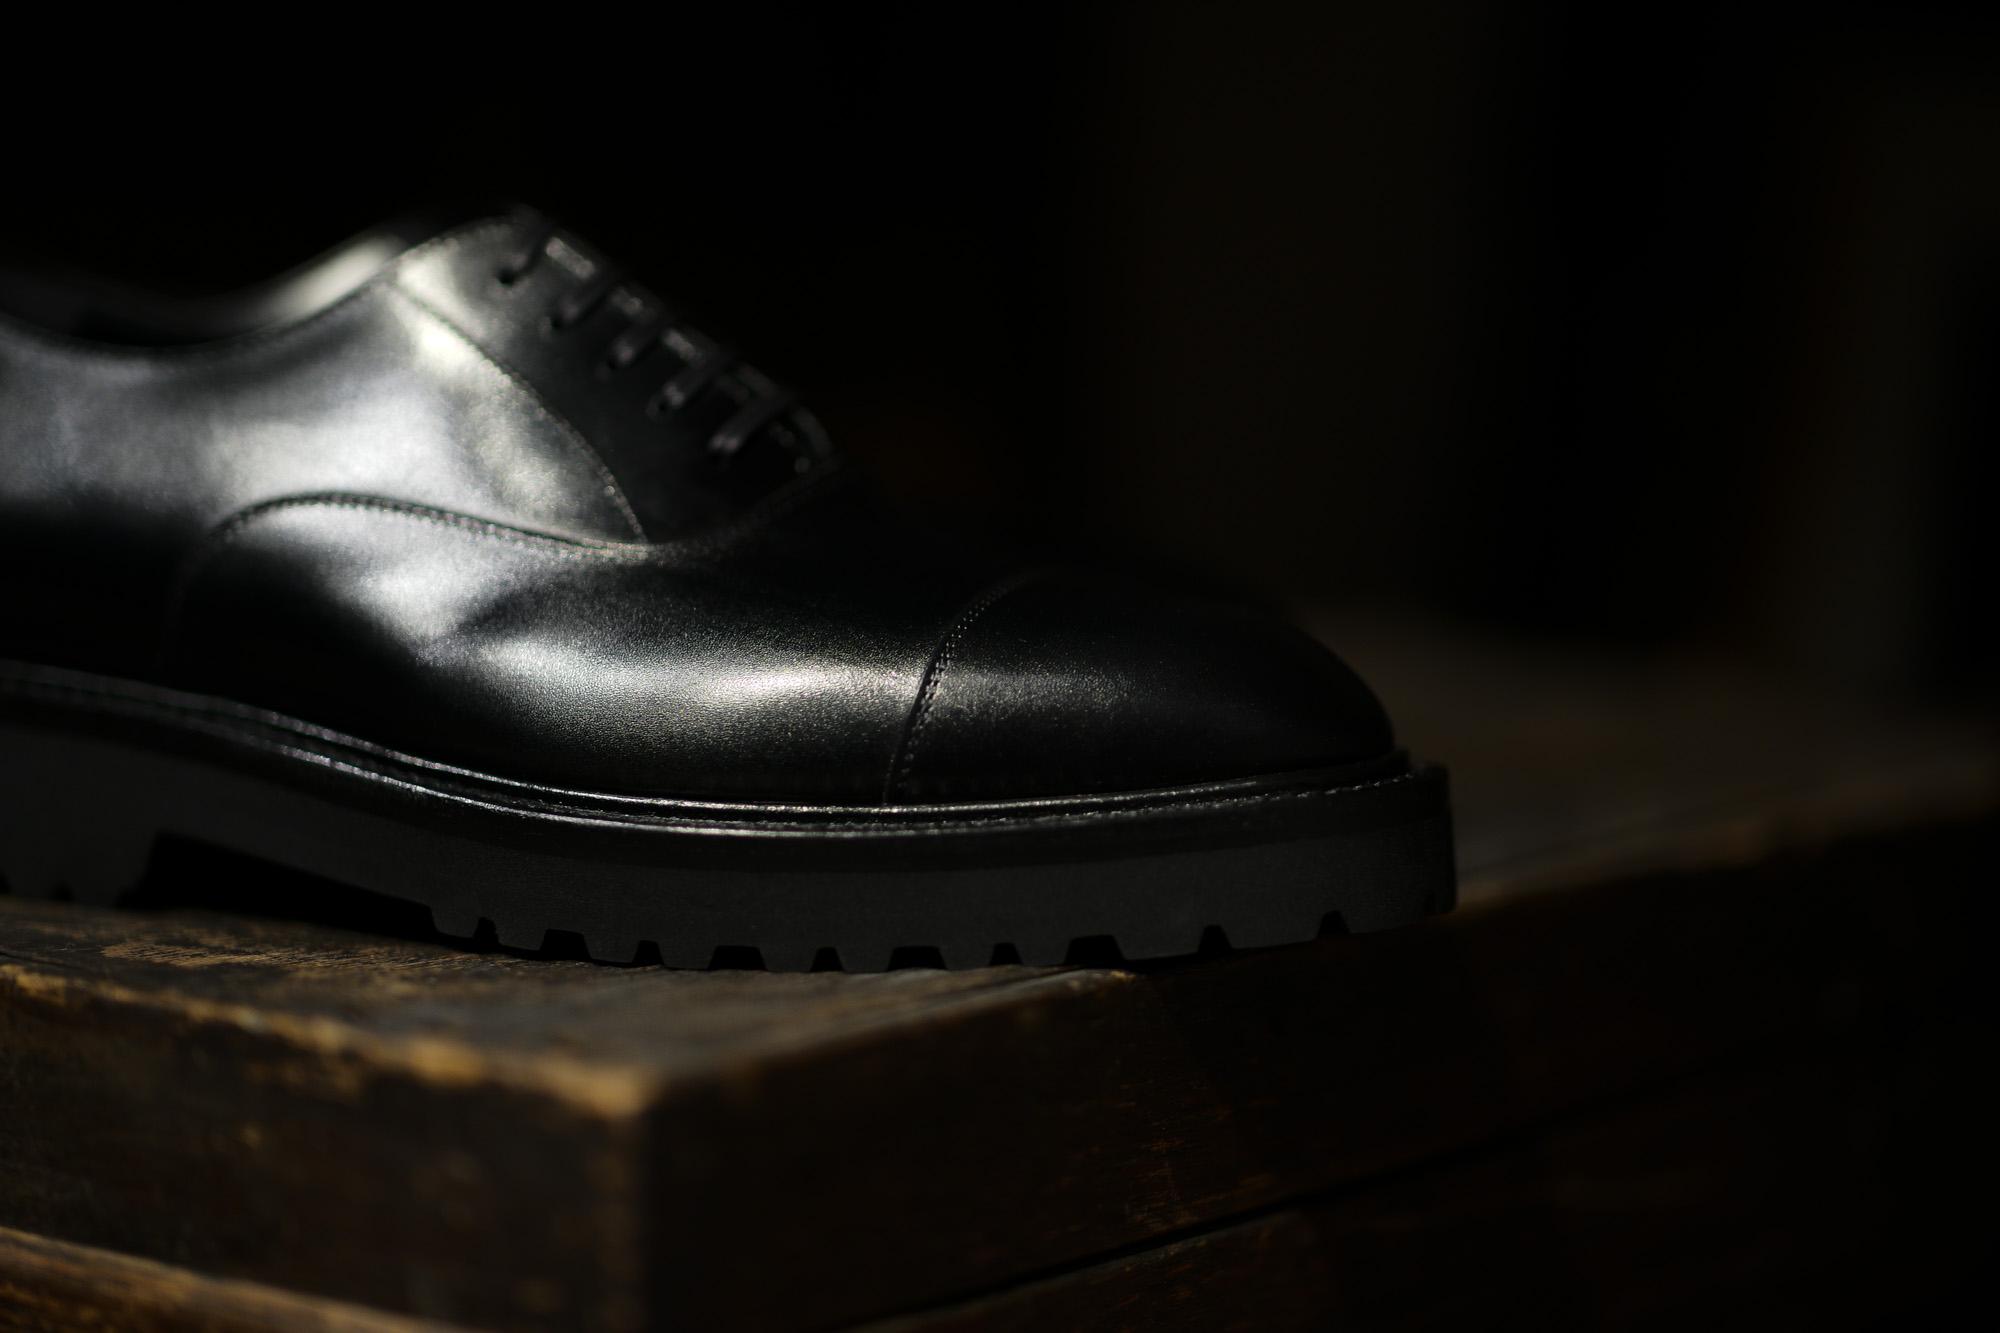 WH (ダブルエイチ) WHS-0110 Straight chip Shoes (干場氏 スペシャル モデル) Trench Last (トレンチラスト) ANNONAY Vocalou Calf Leather ストレートチップ シューズ BLACK (ブラック) MADE IN JAPAN(日本製) 2019 春夏新作【2019春夏フリー分発売中】 干場さん 干場スペシャル FORZASTYLE フォルザスタイル 愛知 名古屋 Alto e Diritto アルト エ デリット